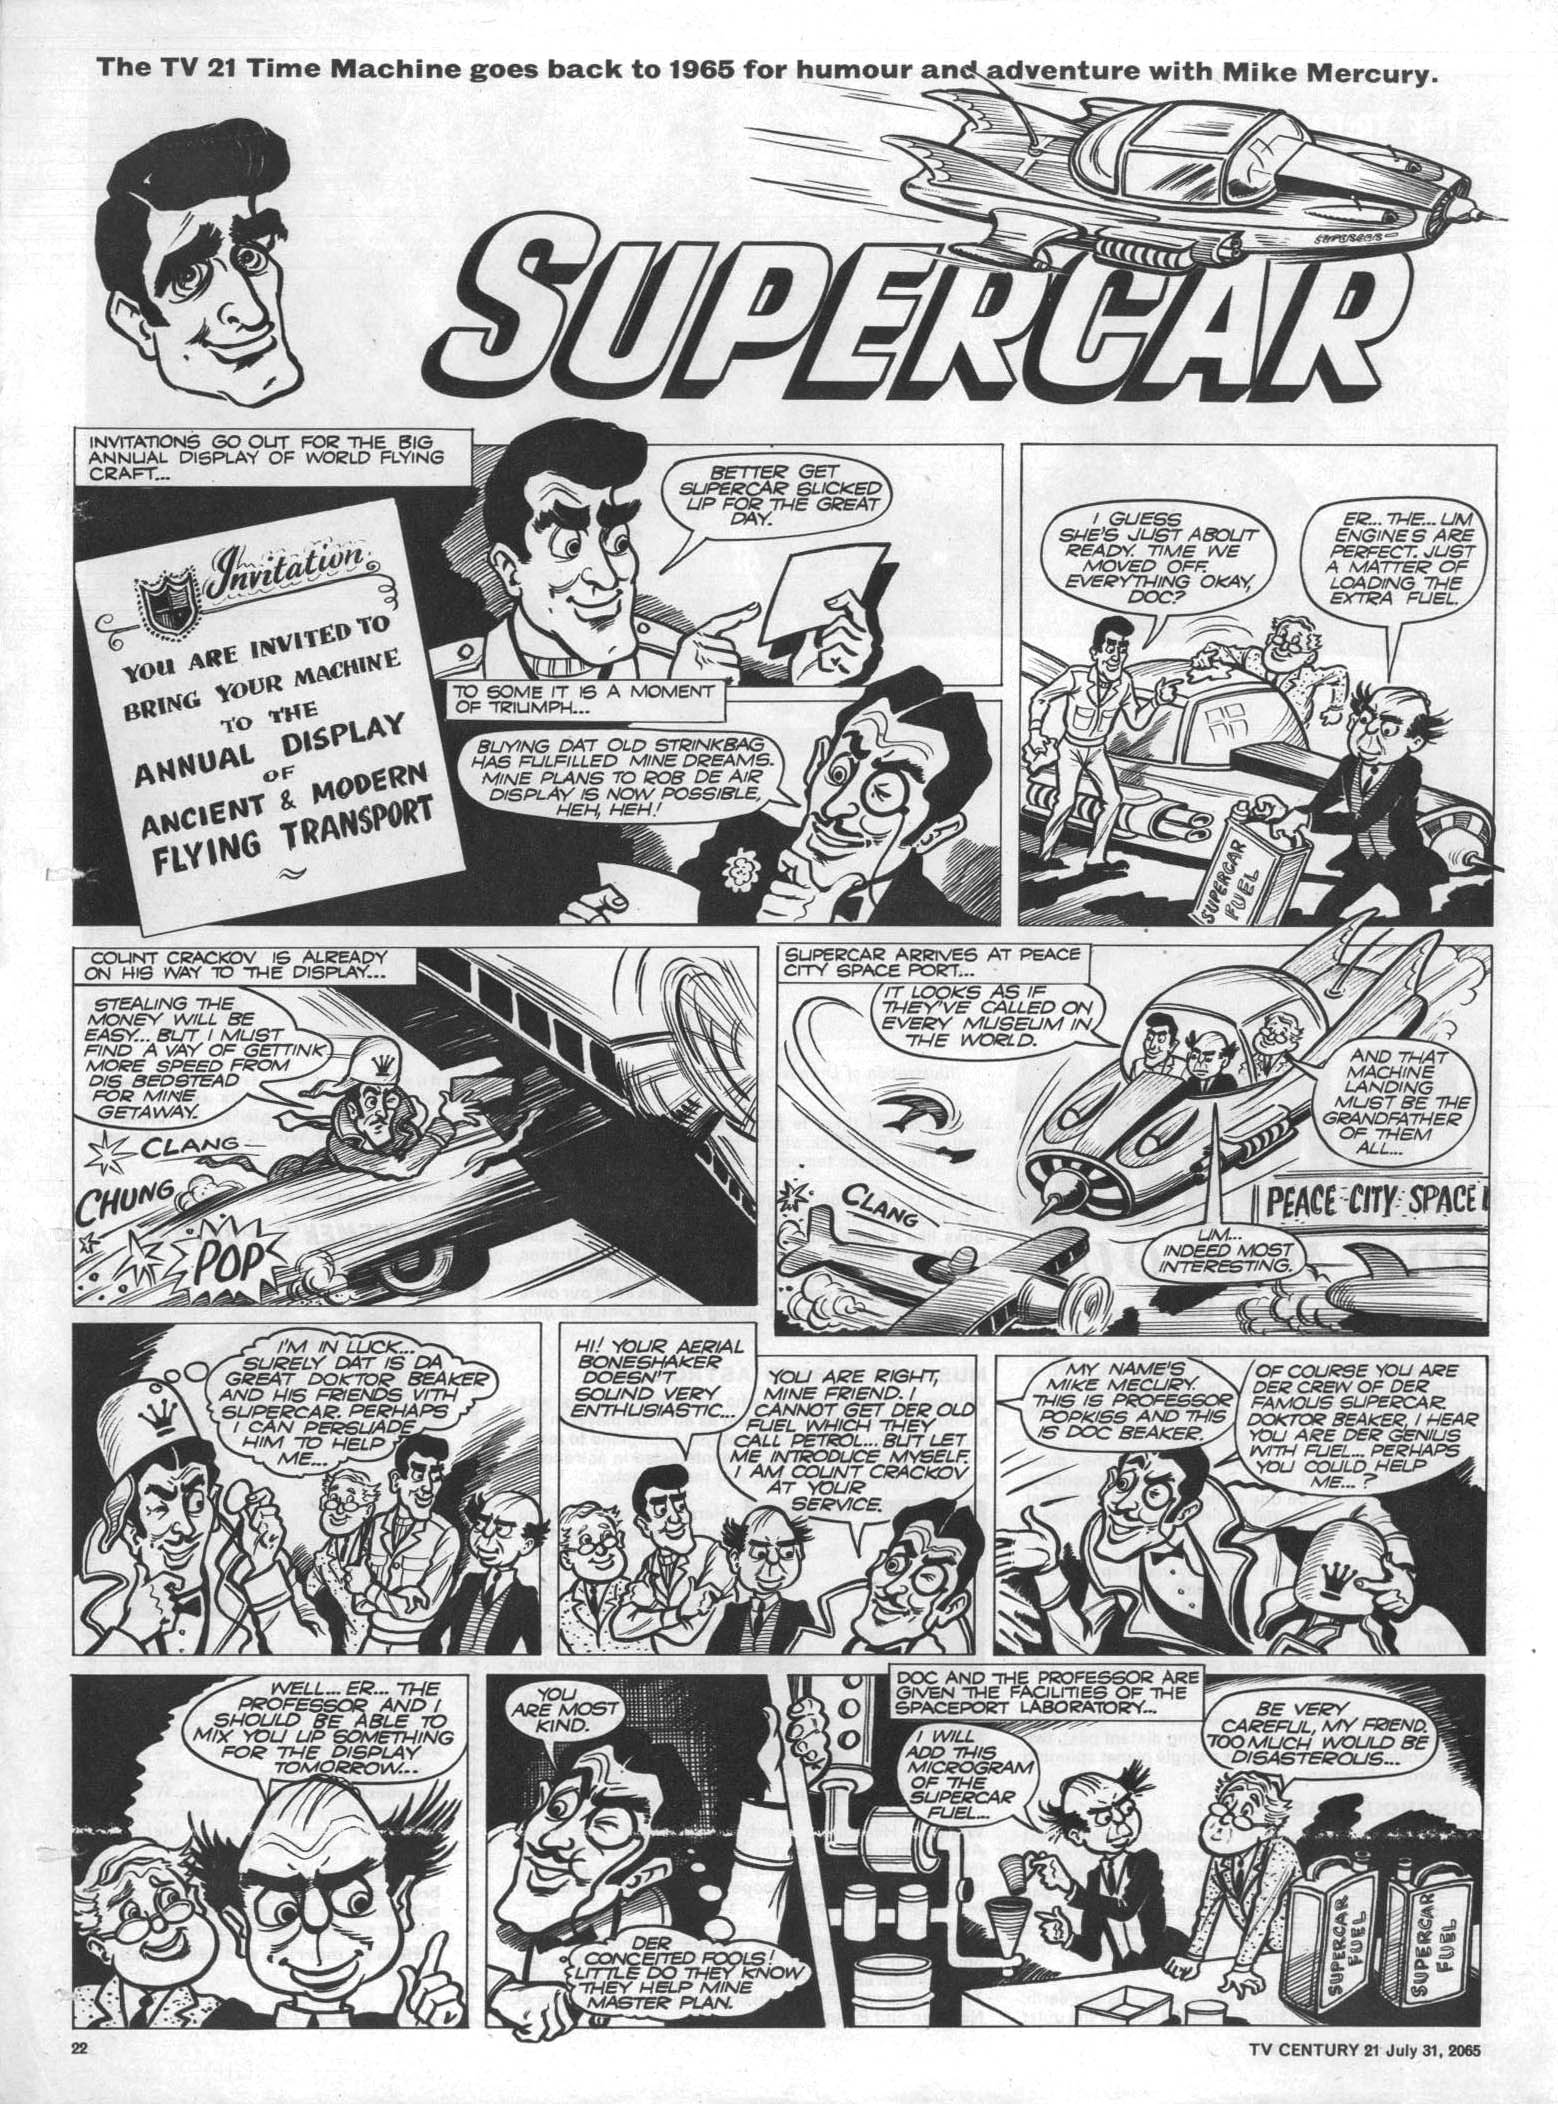 Read online TV Century 21 (TV 21) comic -  Issue #28 - 20